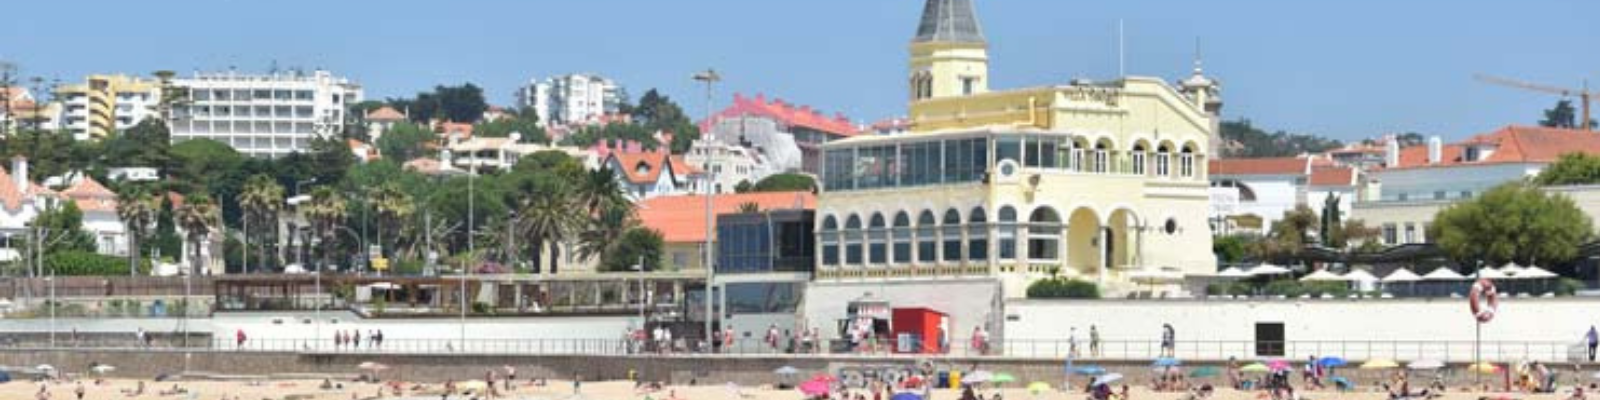 Estoril – Portugal – August 2020